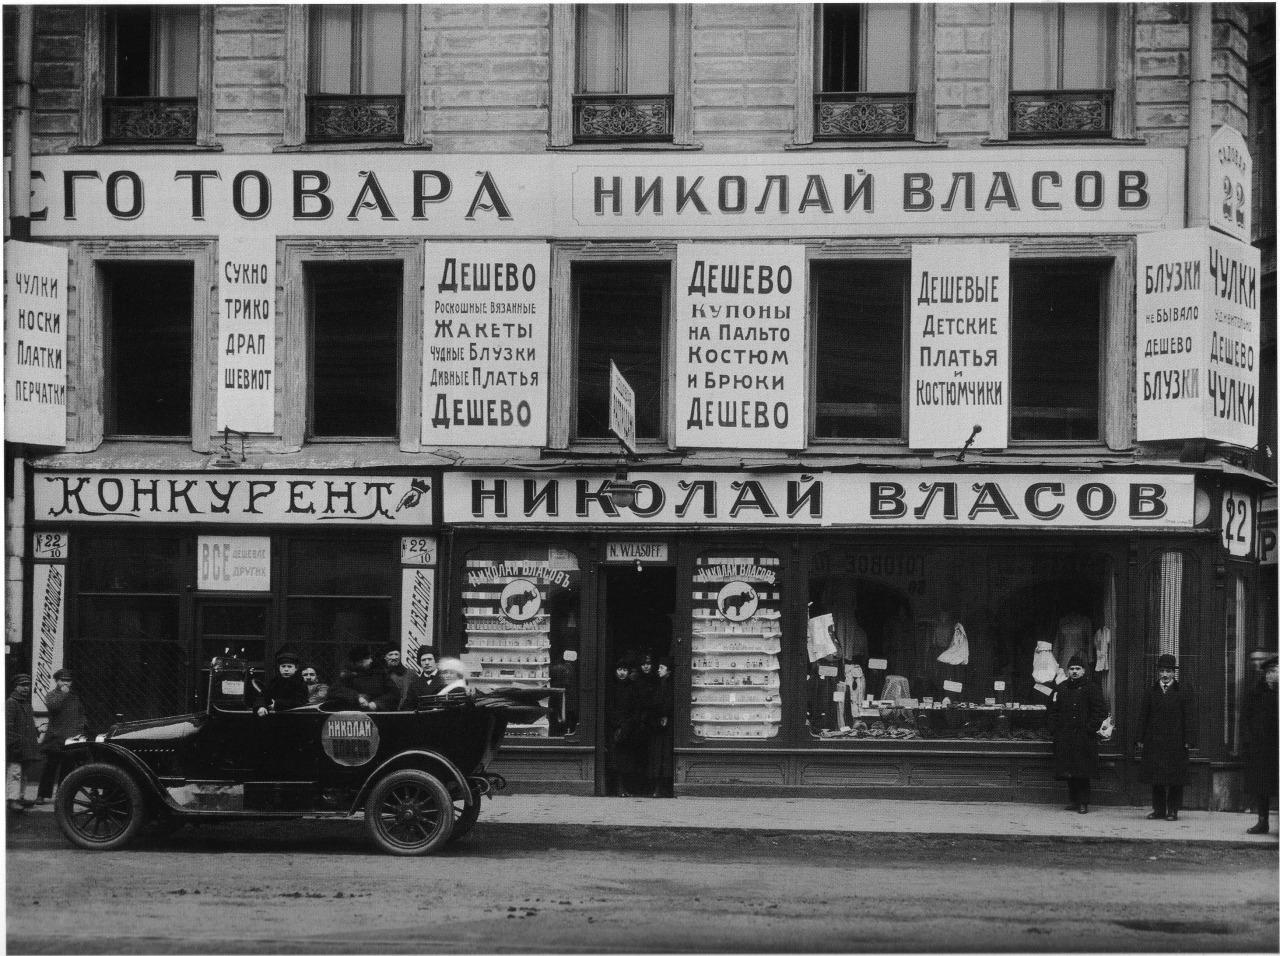 Nikolai Vlasov clothing store, Leningrad, 1920s.jpg